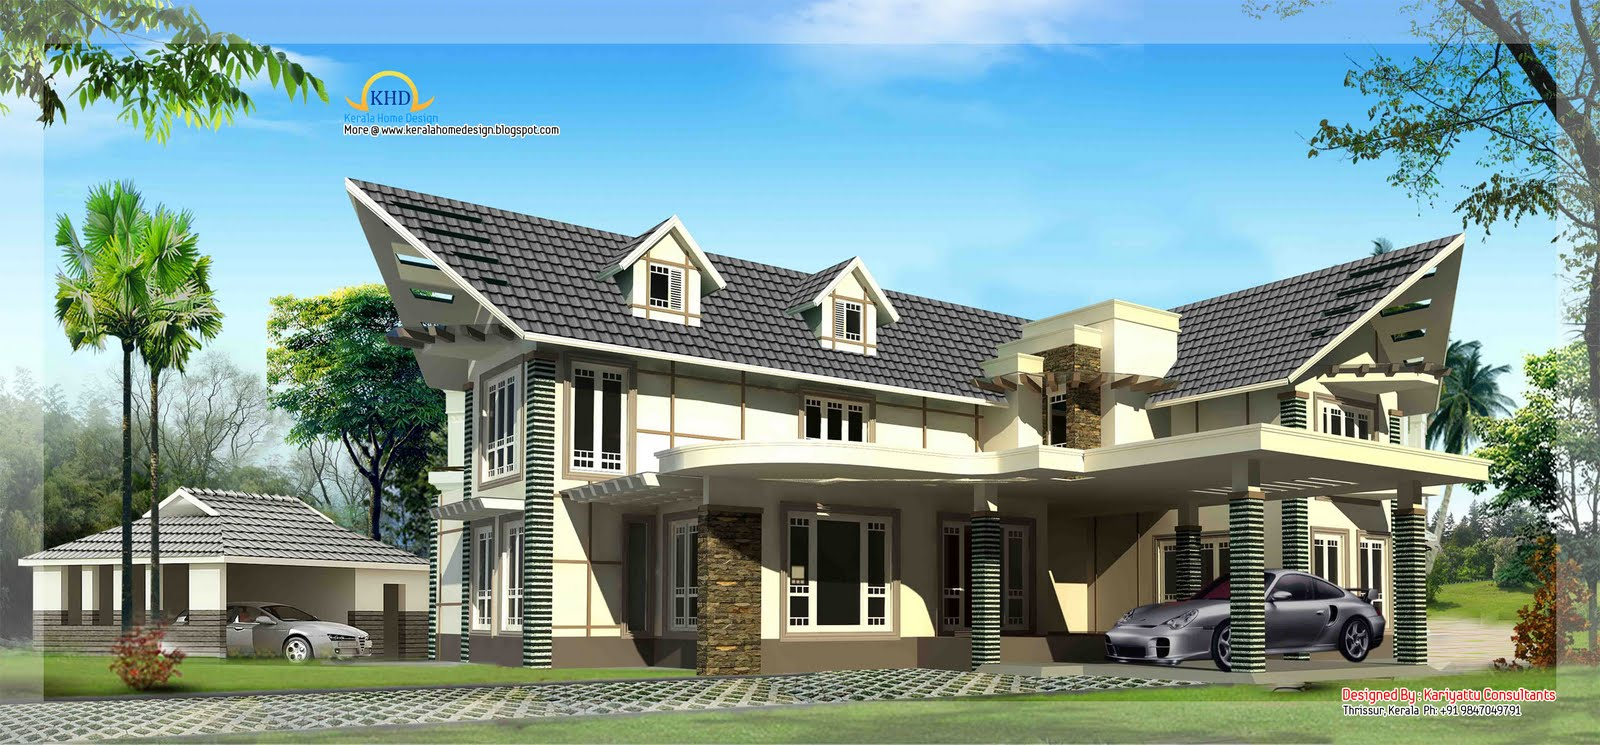 Beautiful Luxury Home 3255 Sq Ft Kerala Home Design And Floor